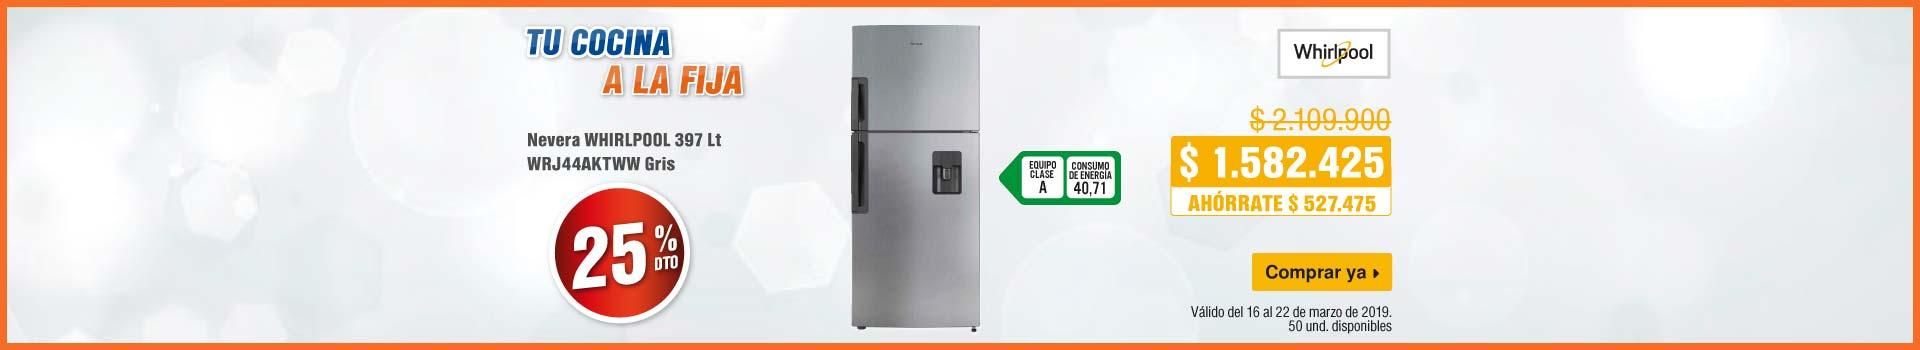 AK-KT-mayores-1-ELECT-BCAT-refrigeracion-WHIRLPOOL-160319